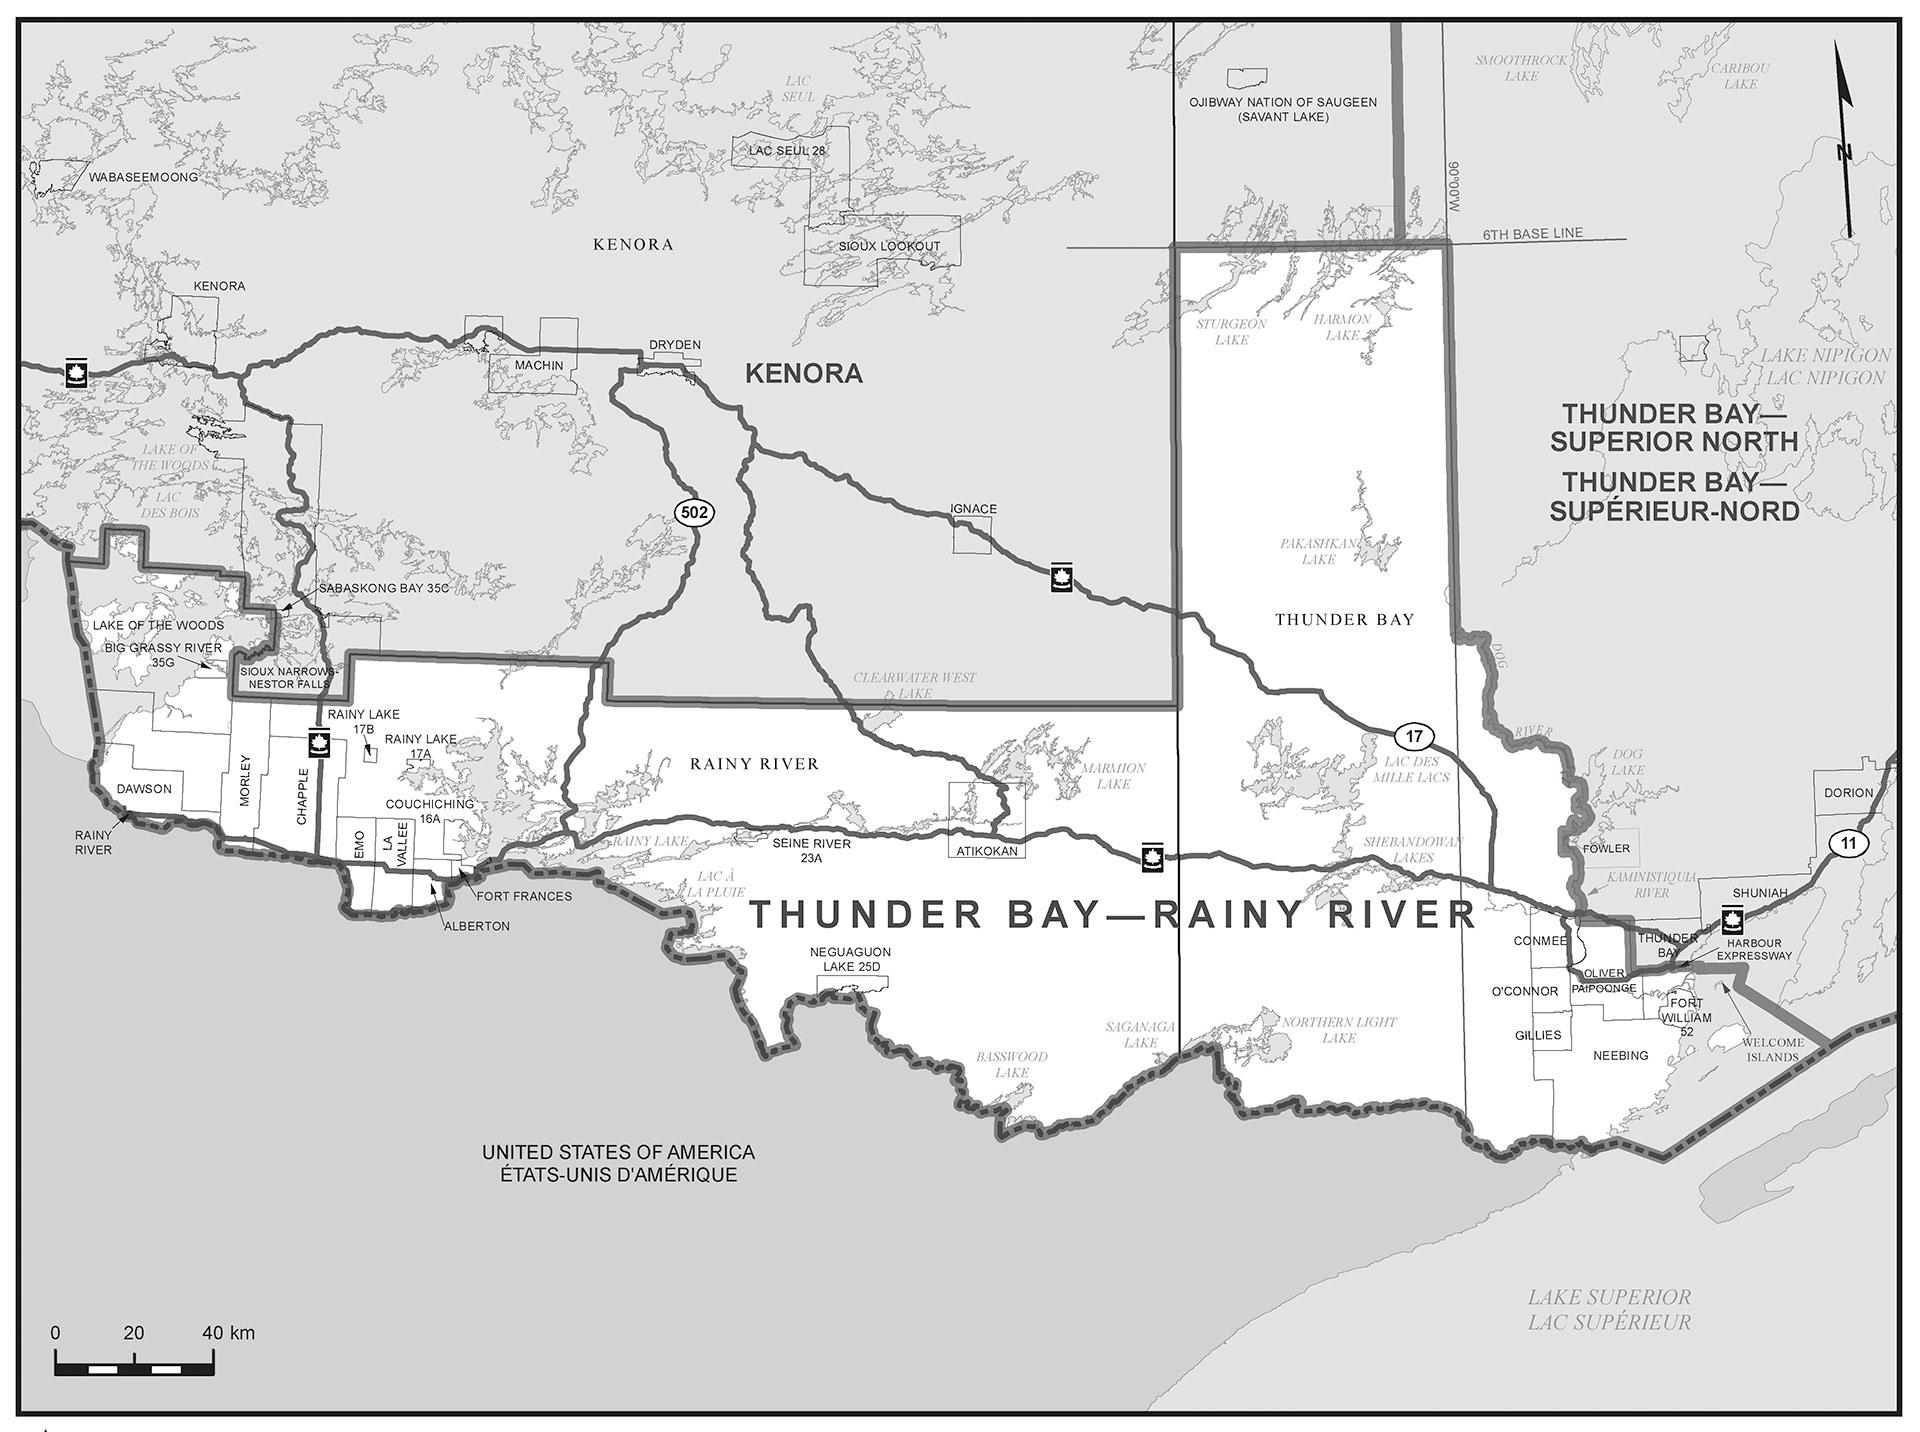 Rainy River Conservative Electoral District